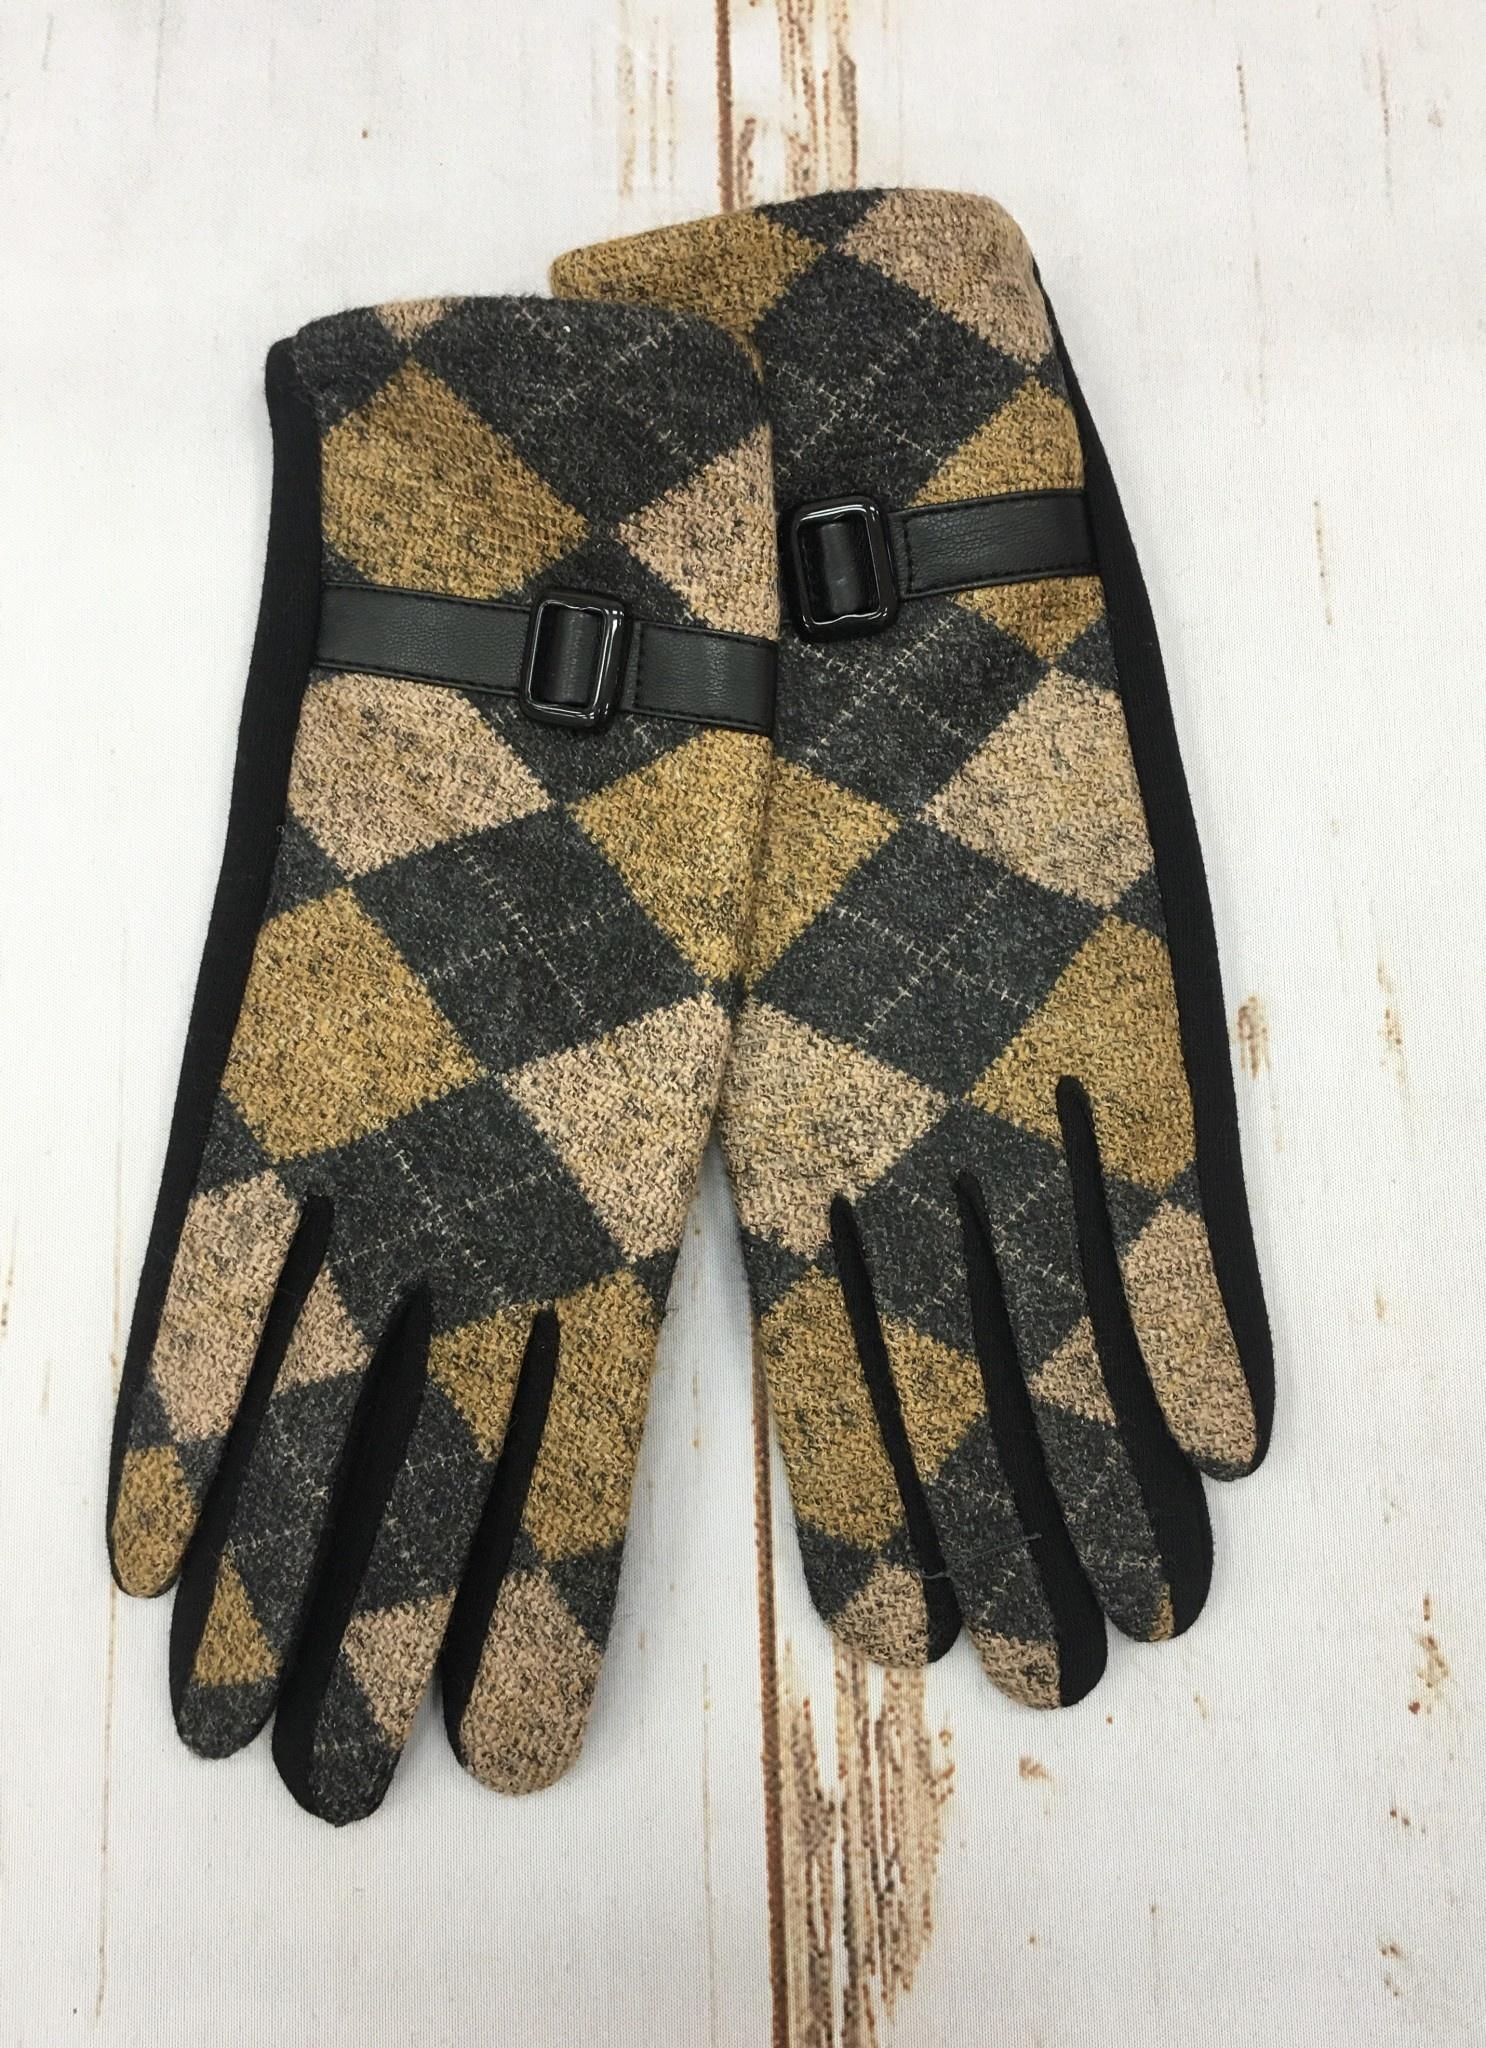 Accessorize Me Mustard Argyle Glove